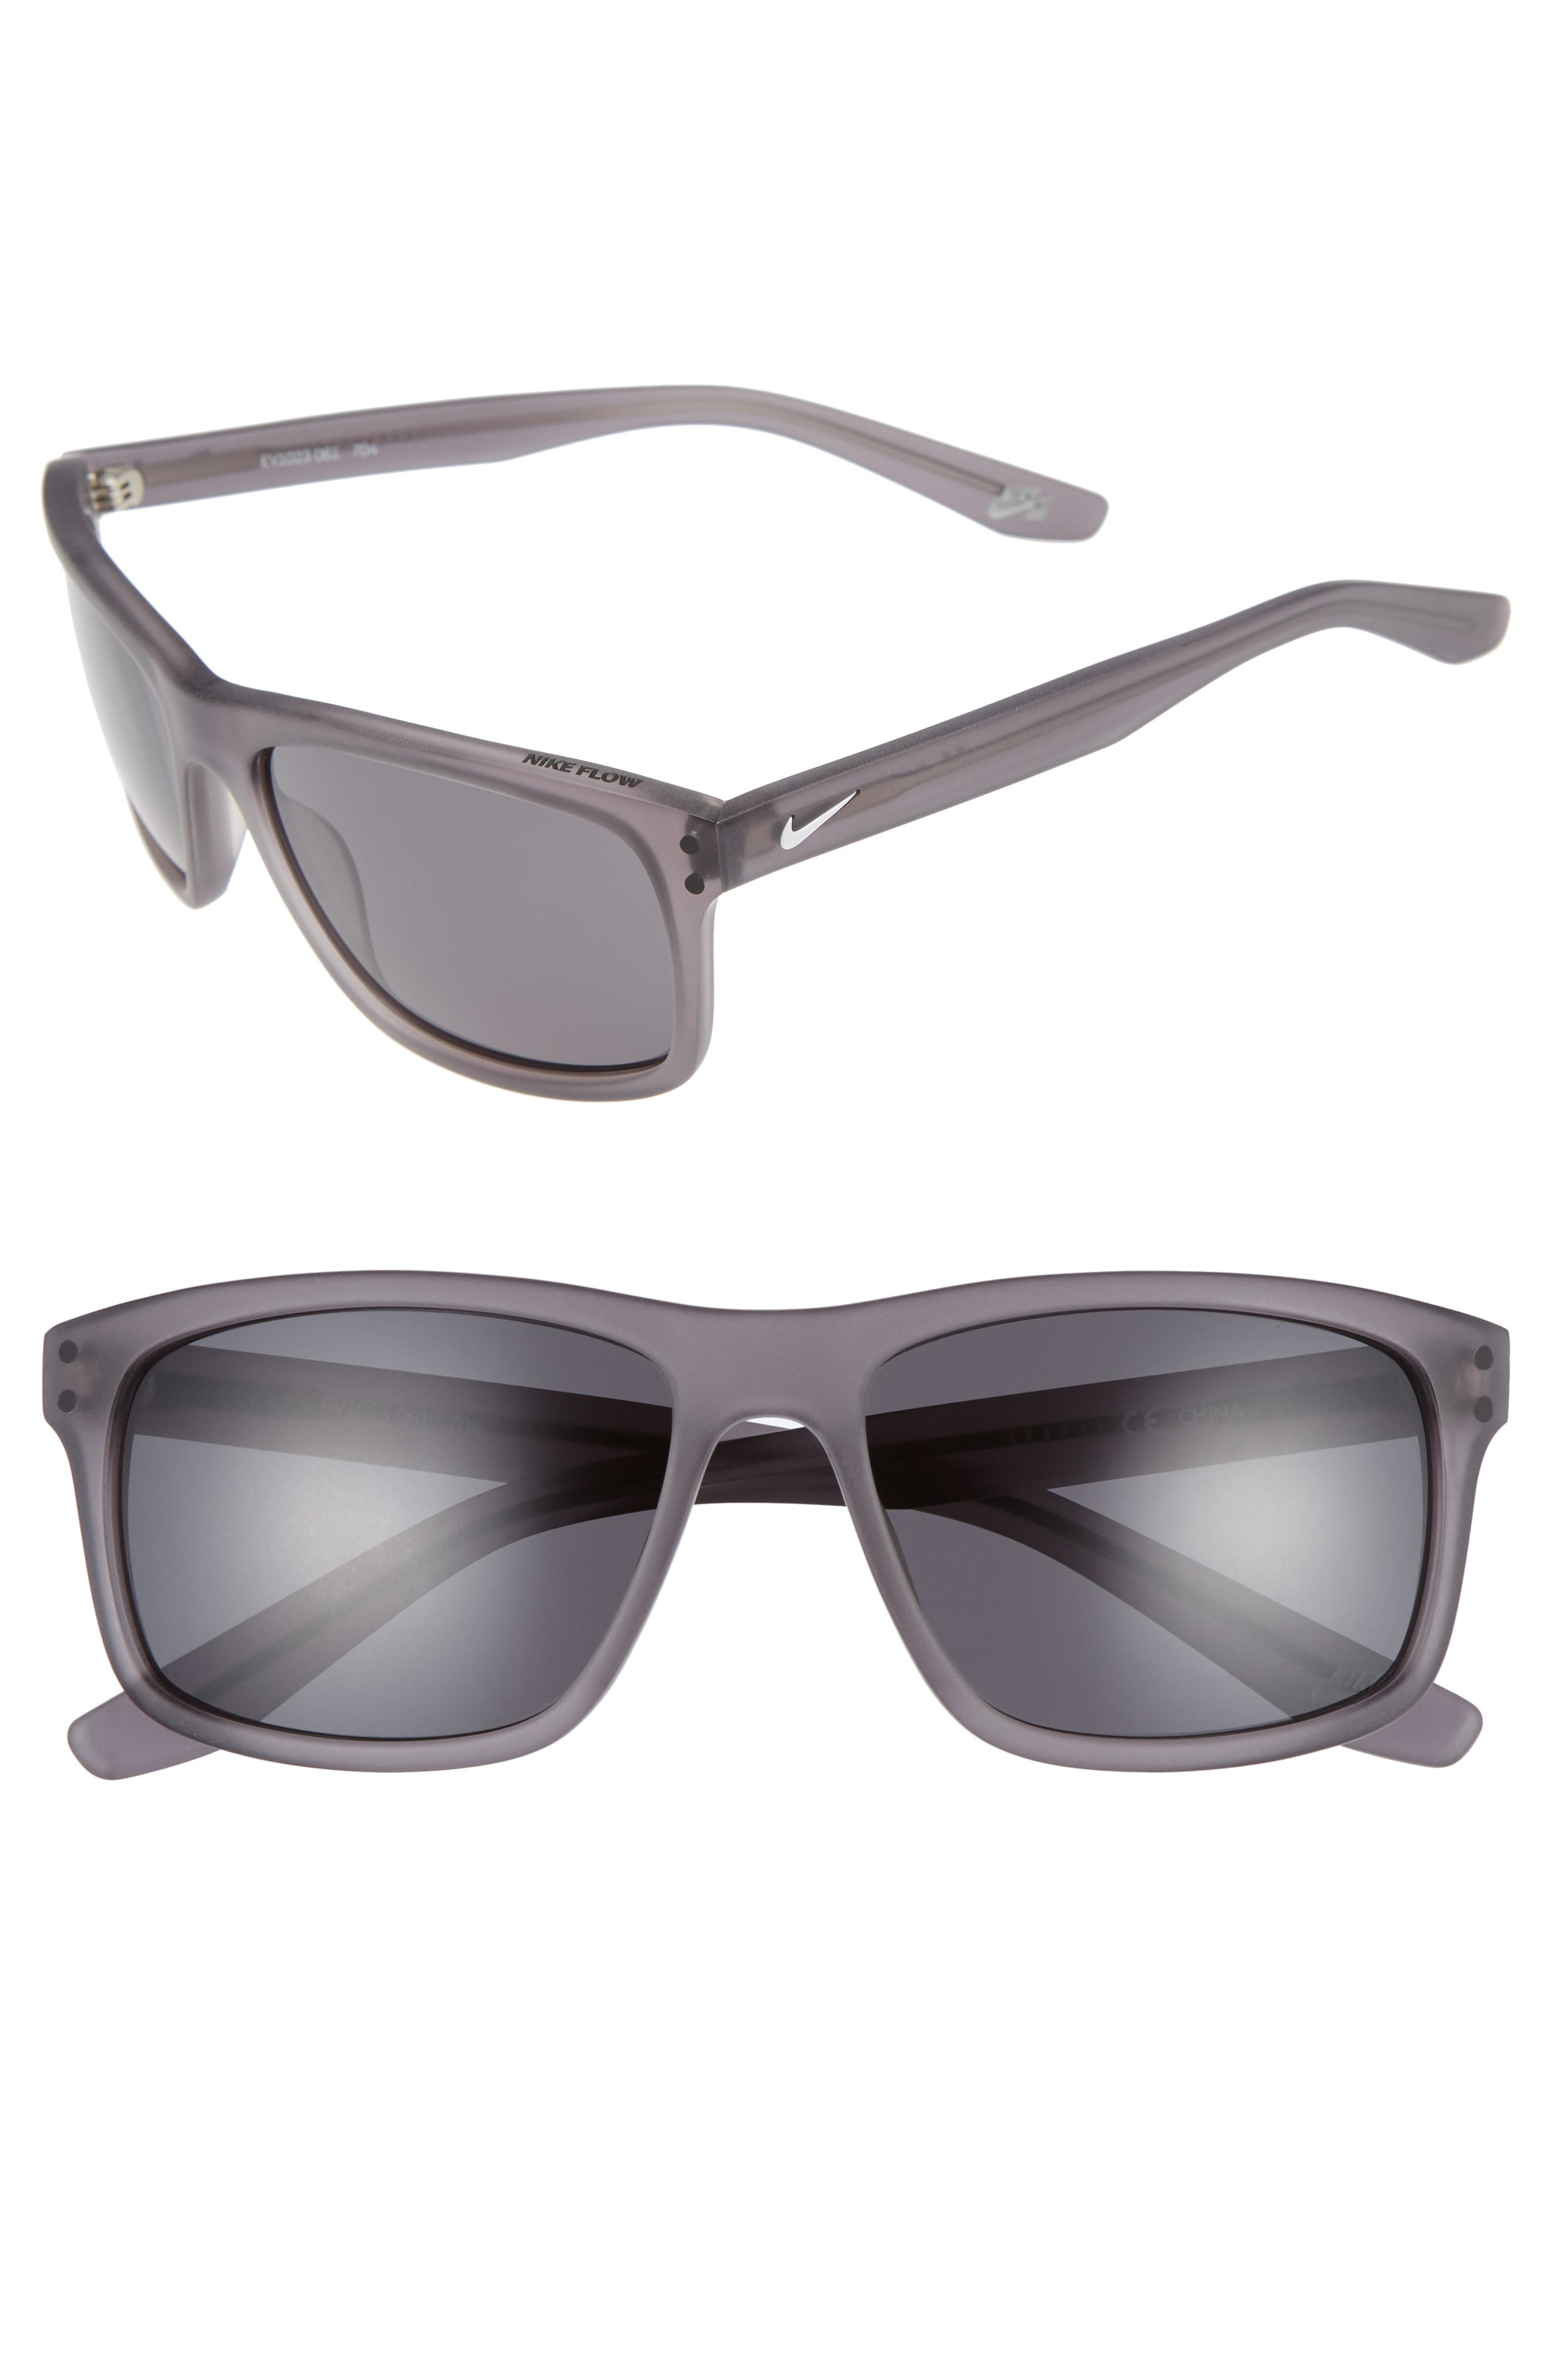 Nike Flow 5m Sunglasses - Matte Anthracite